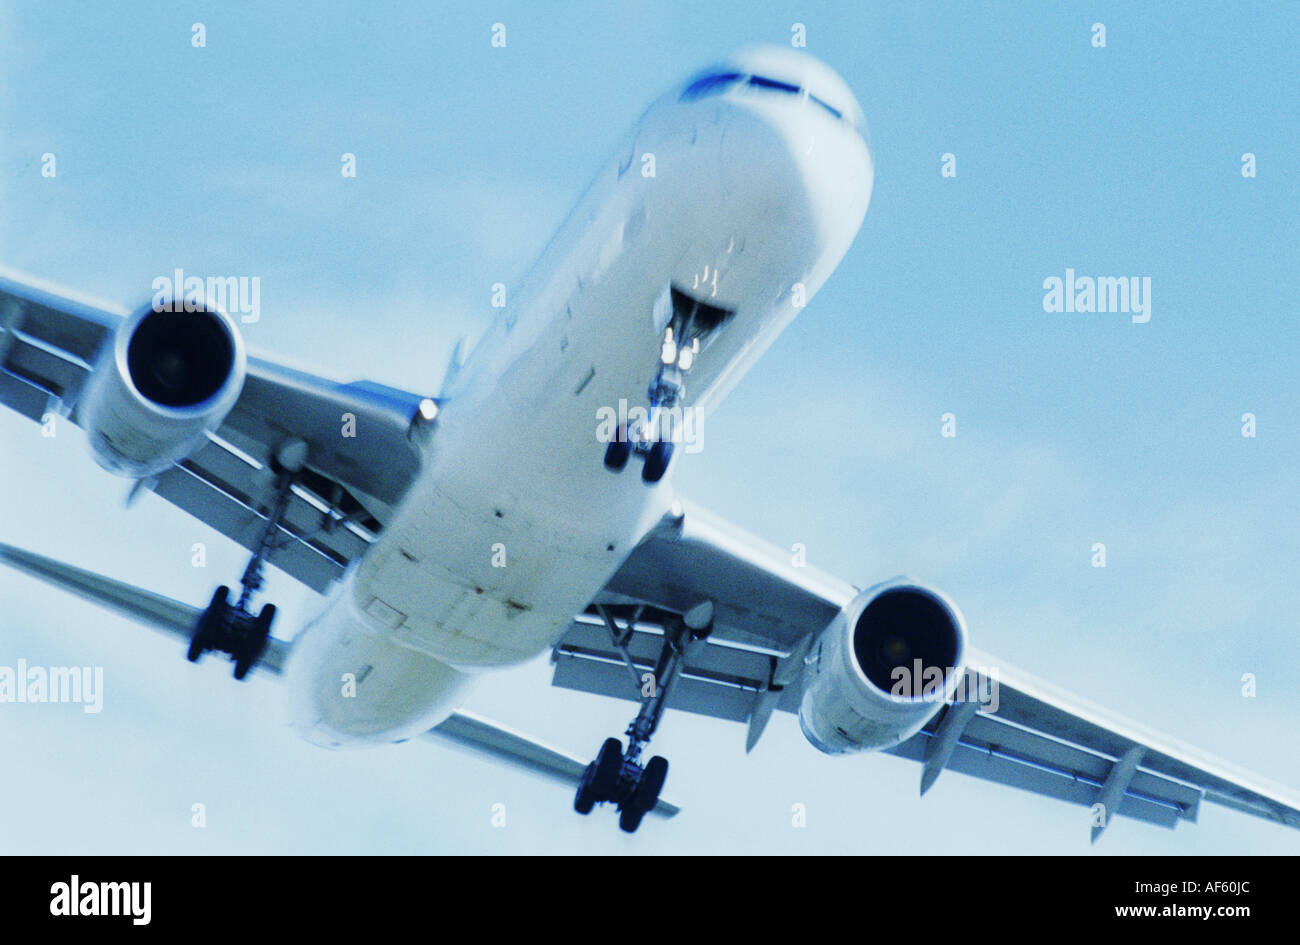 plane aeroplane airplane detail close fly - Stock Image